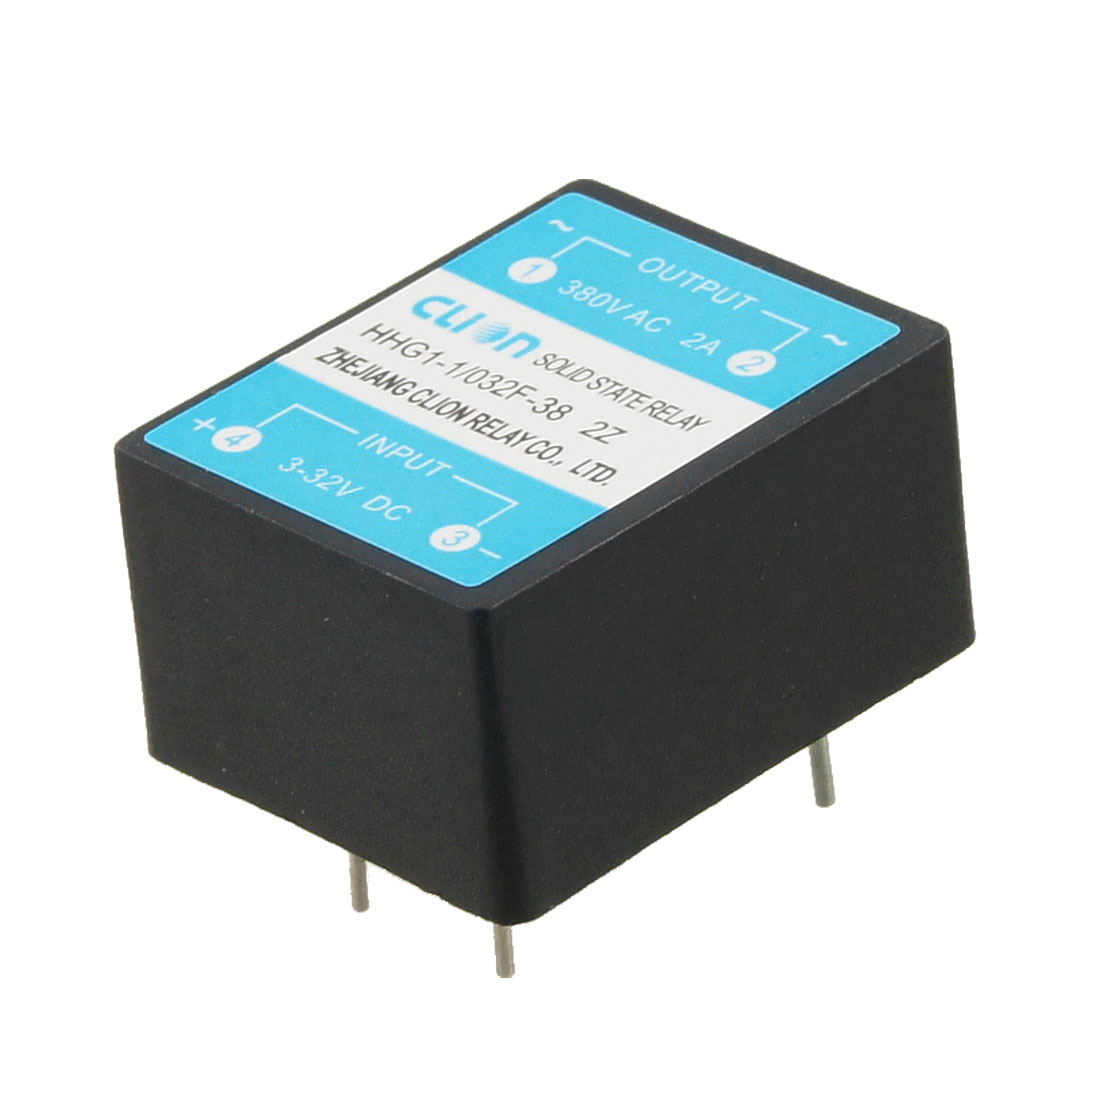 HHG1-1/032F-38 2Z Input 3-32V DC Output 2A 380V AC PCB Solid State Relay